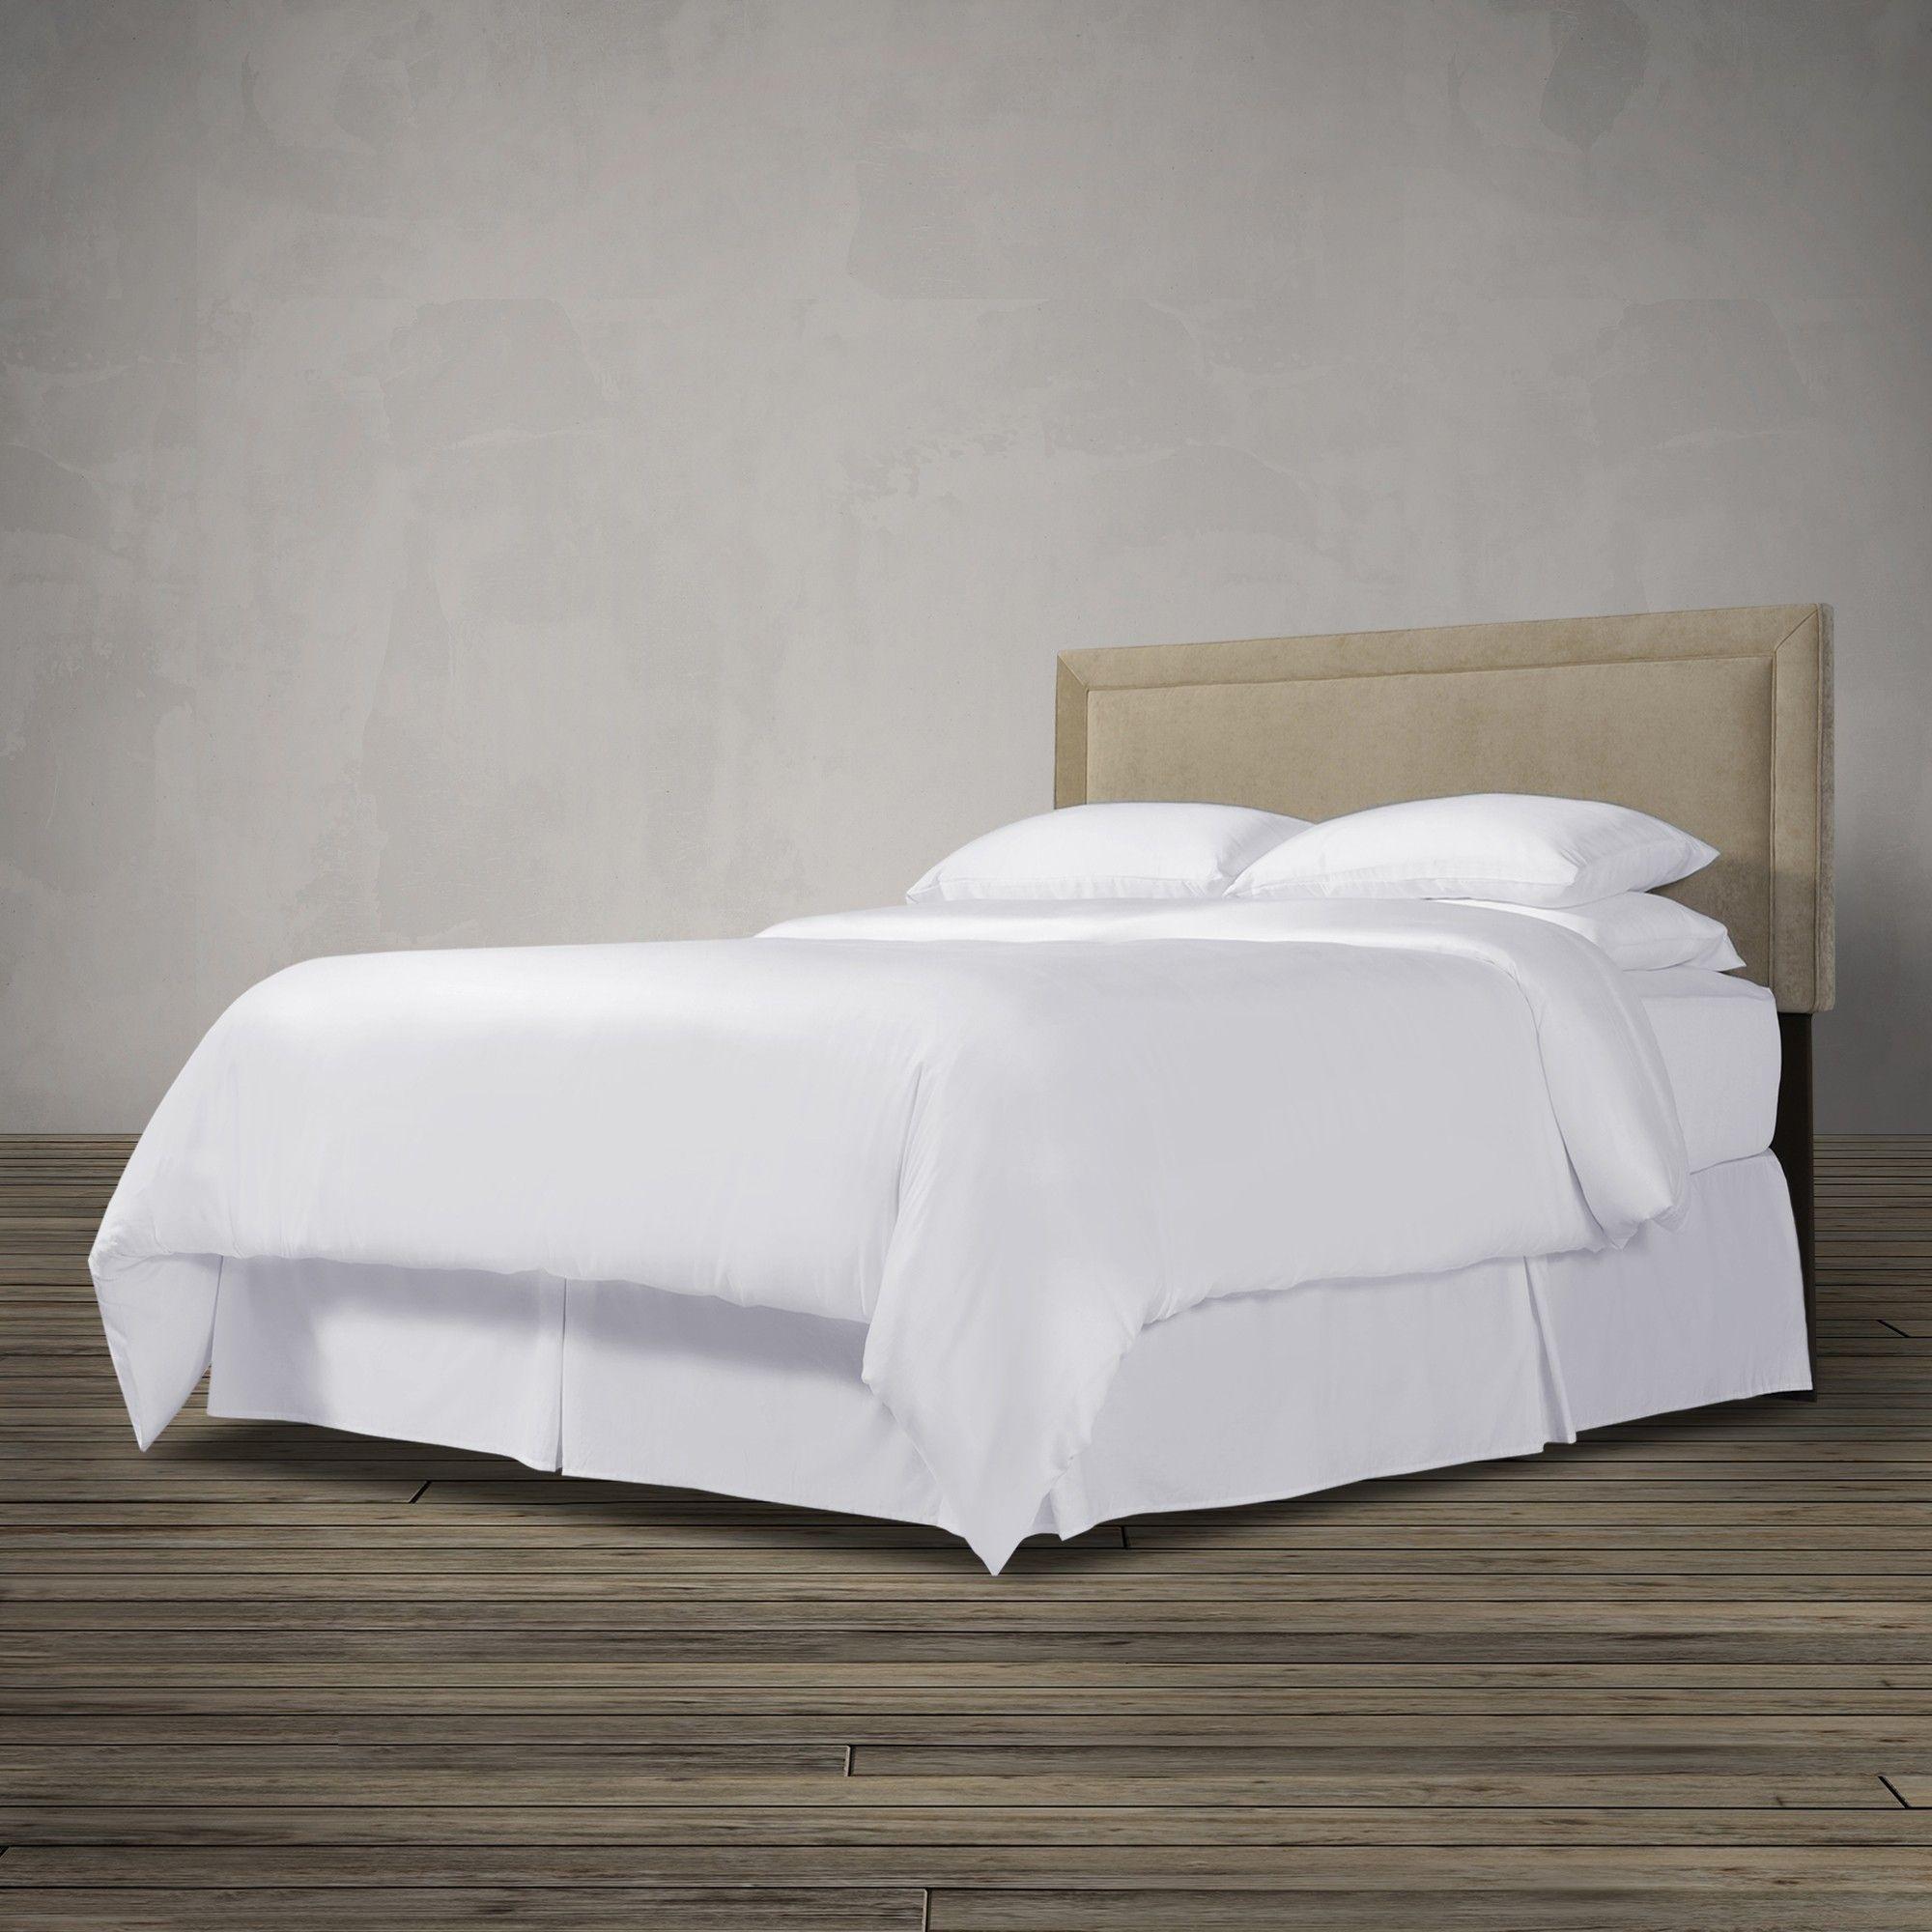 For A Sleek Timeless Bedroom Focal Point The Palma Headboard